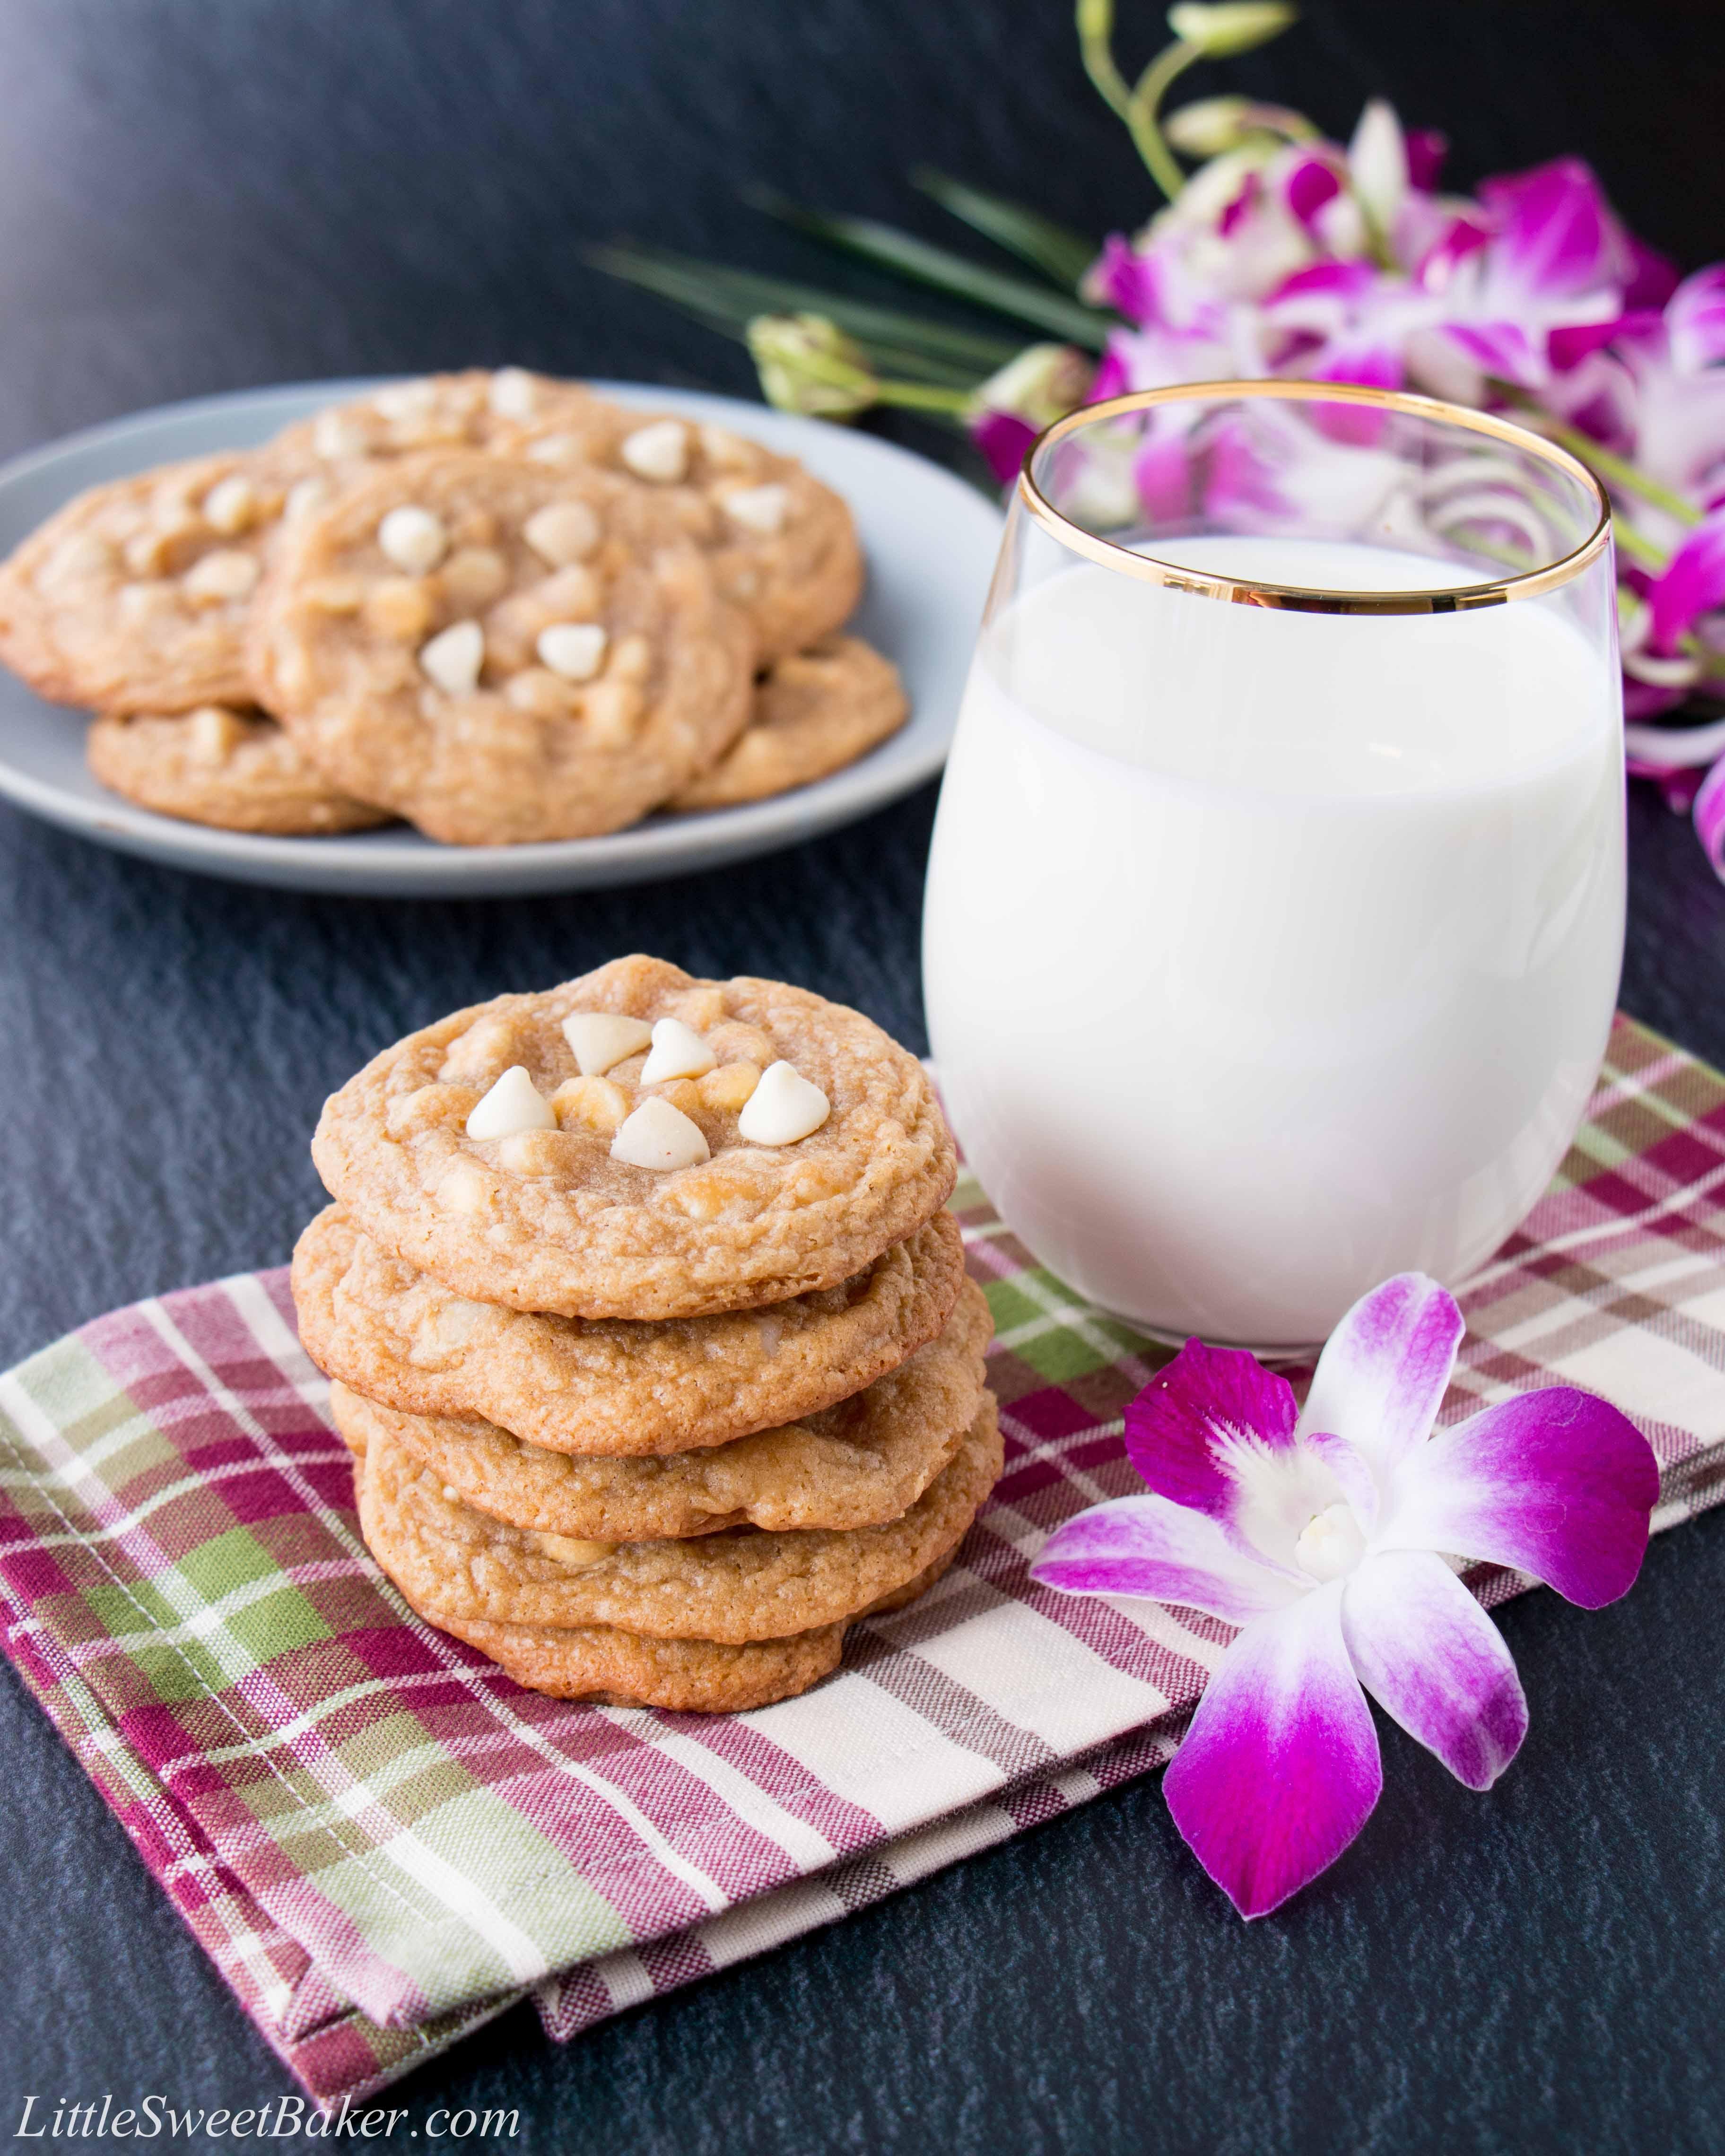 White chocolate macadamia nut cookies little sweet baker for White chocolate macadamia nut cookies recipe paula deen